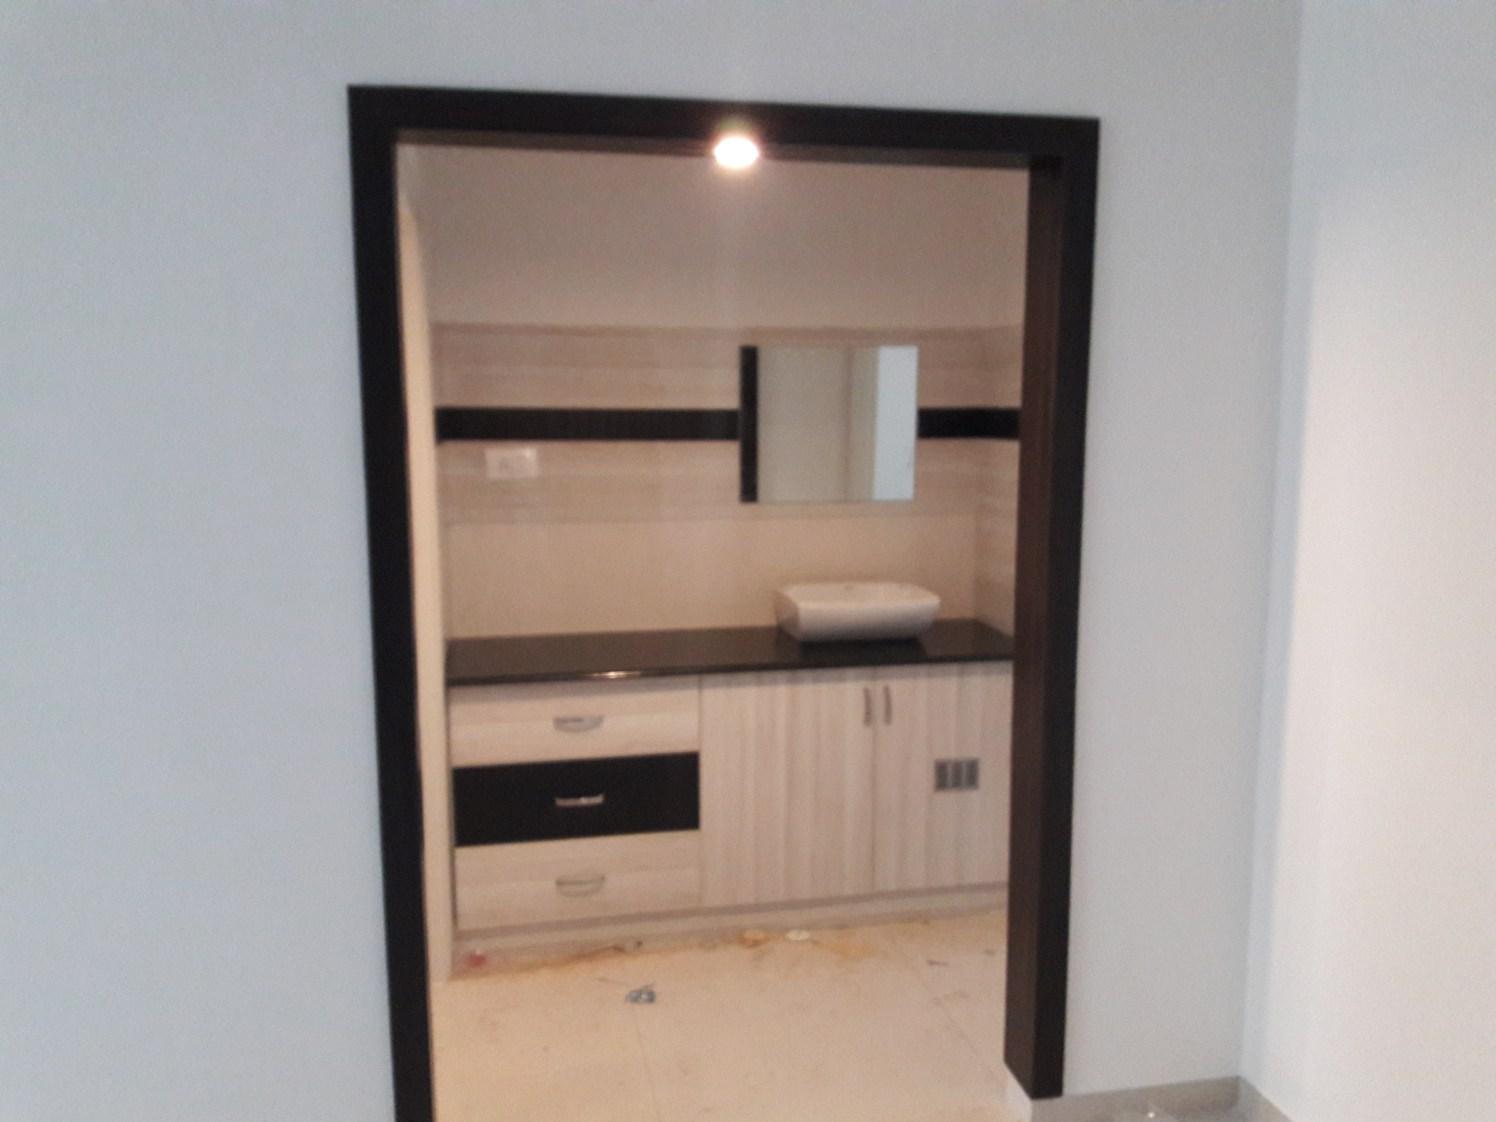 Modular Kitchen by Divine home interiors  Modular-kitchen Contemporary | Interior Design Photos & Ideas